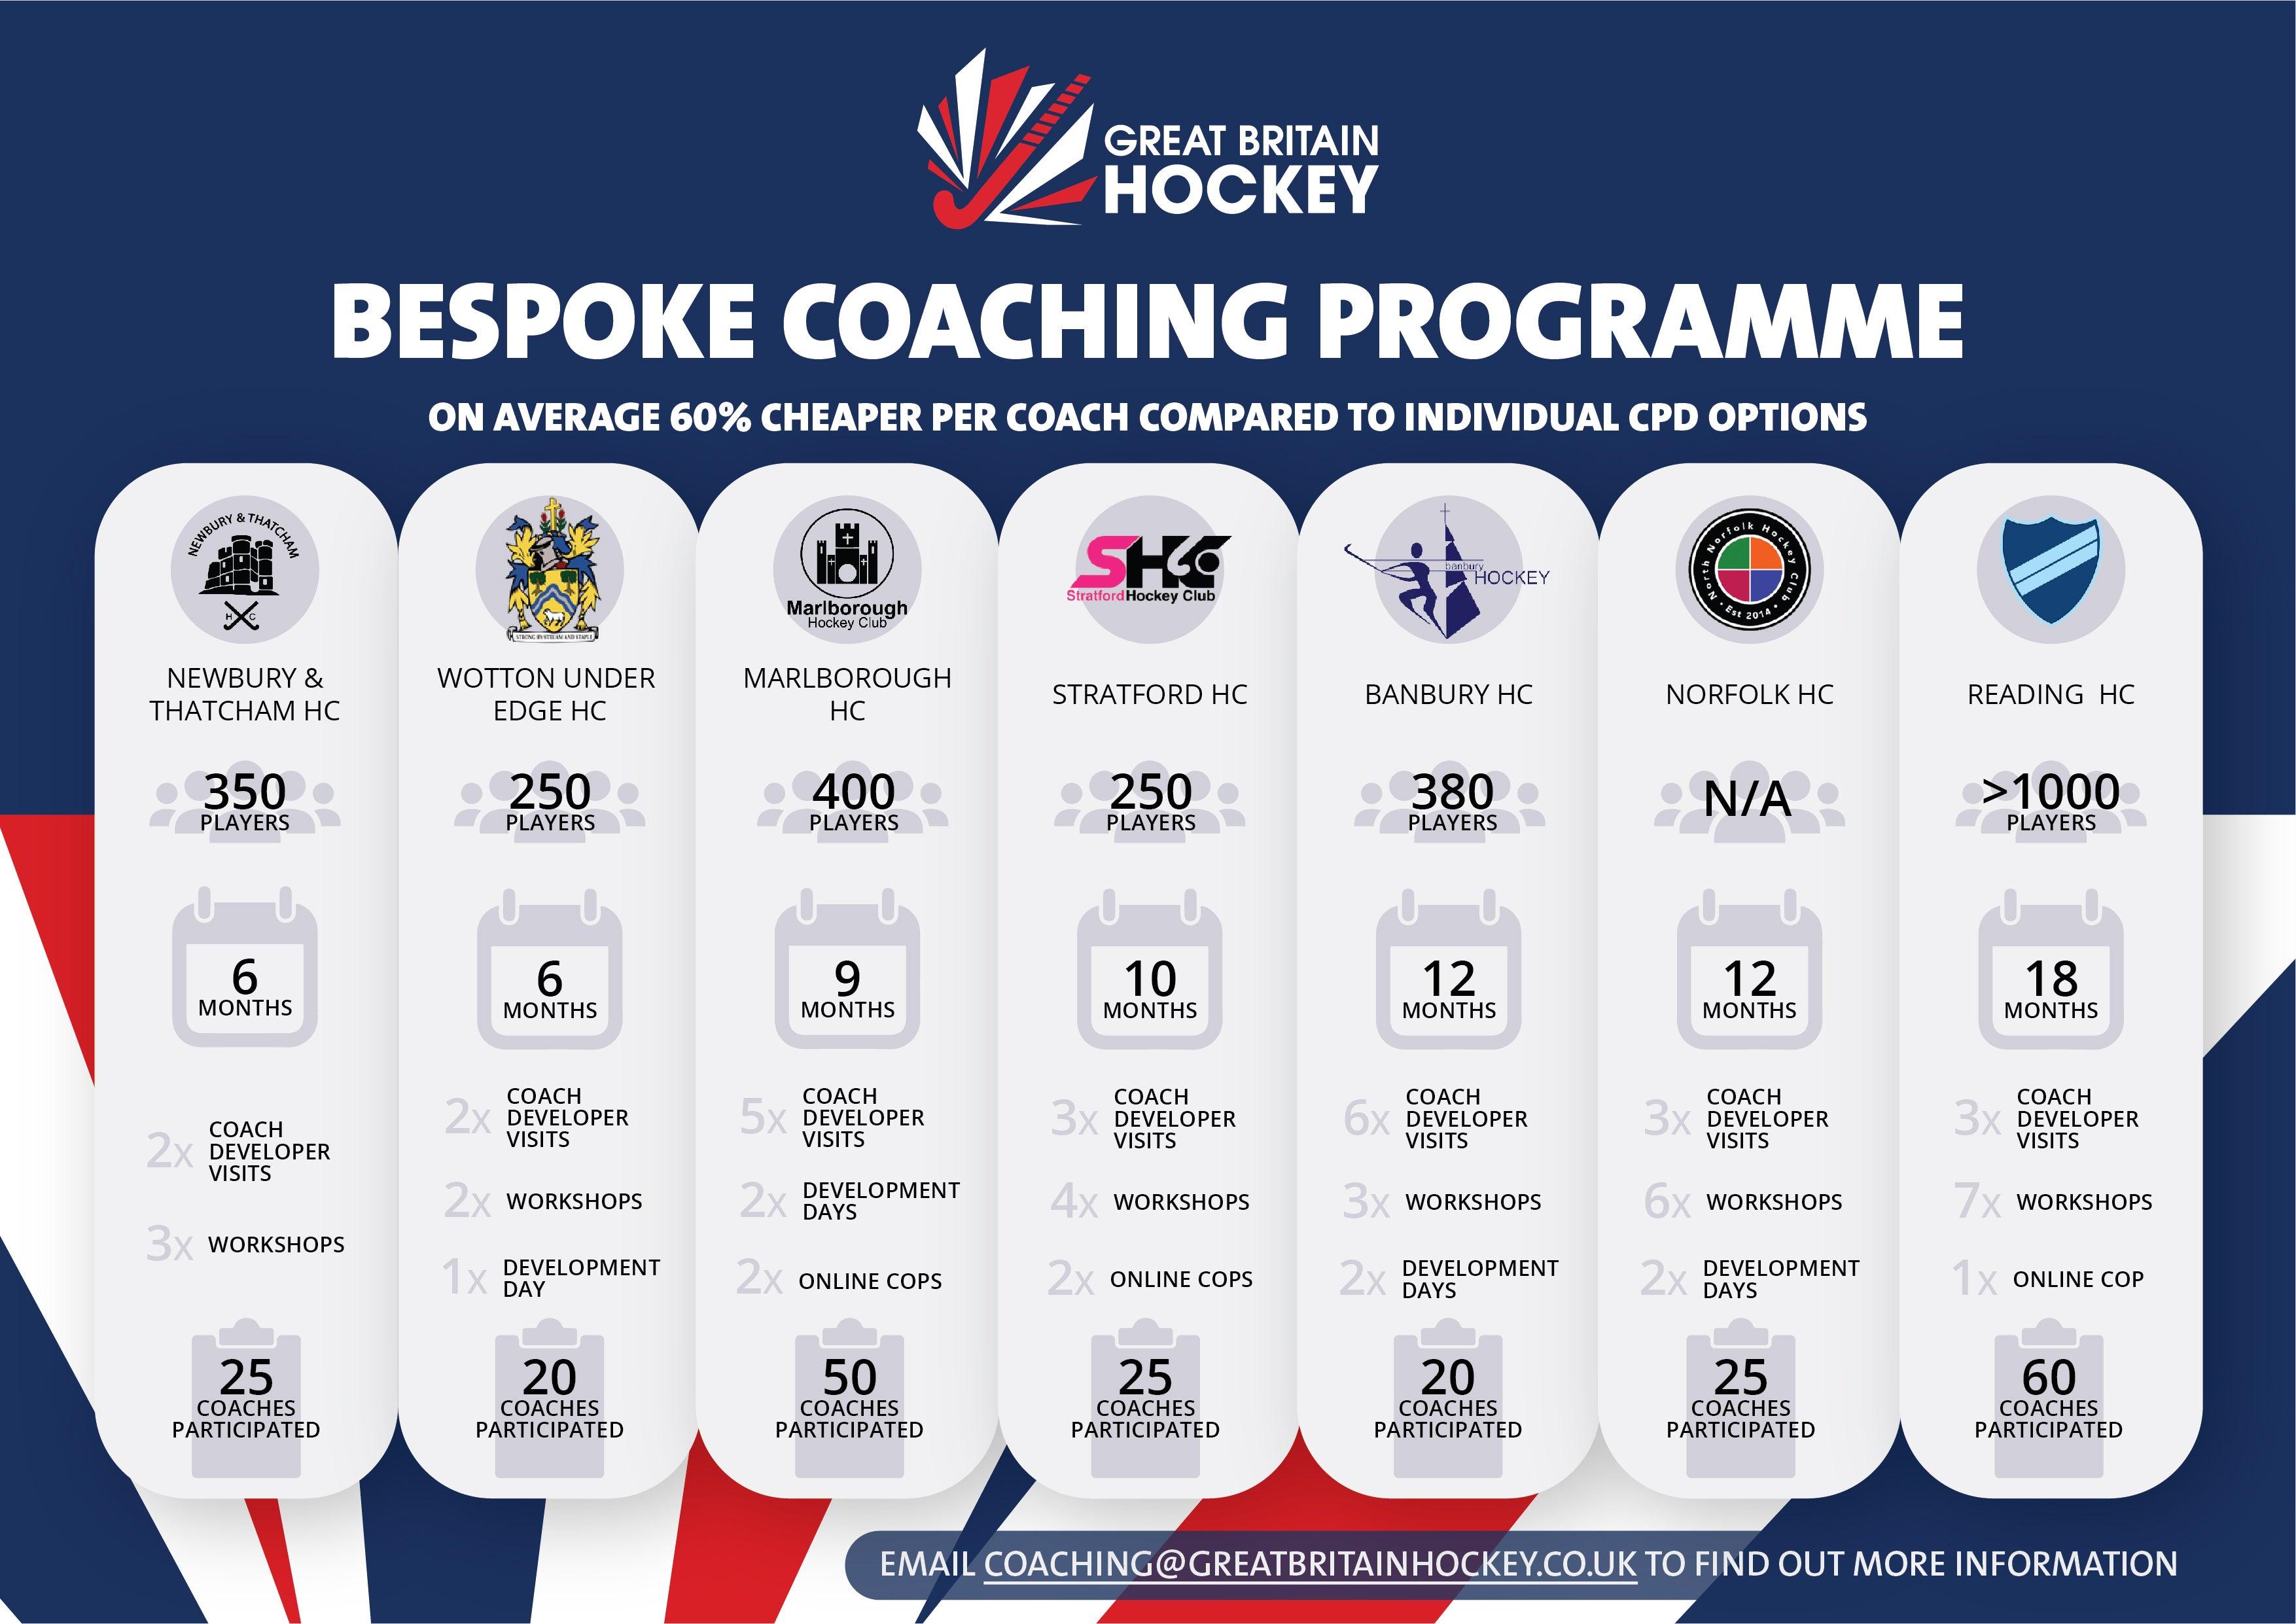 Great Britain Hockey Bespoke Coaching Programme Infographic